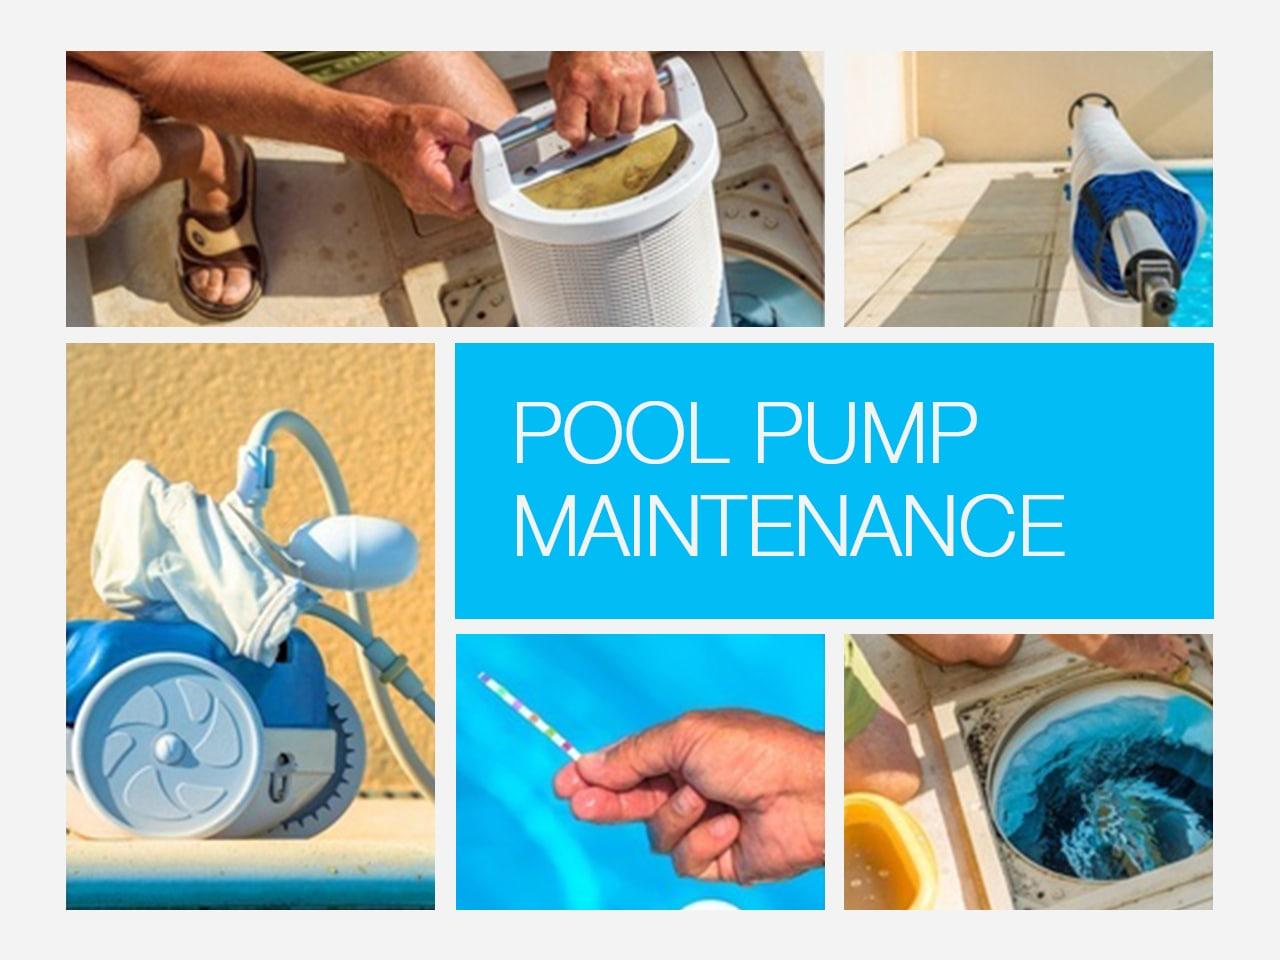 3 diy steps to determine pool pump cycle duration in hours